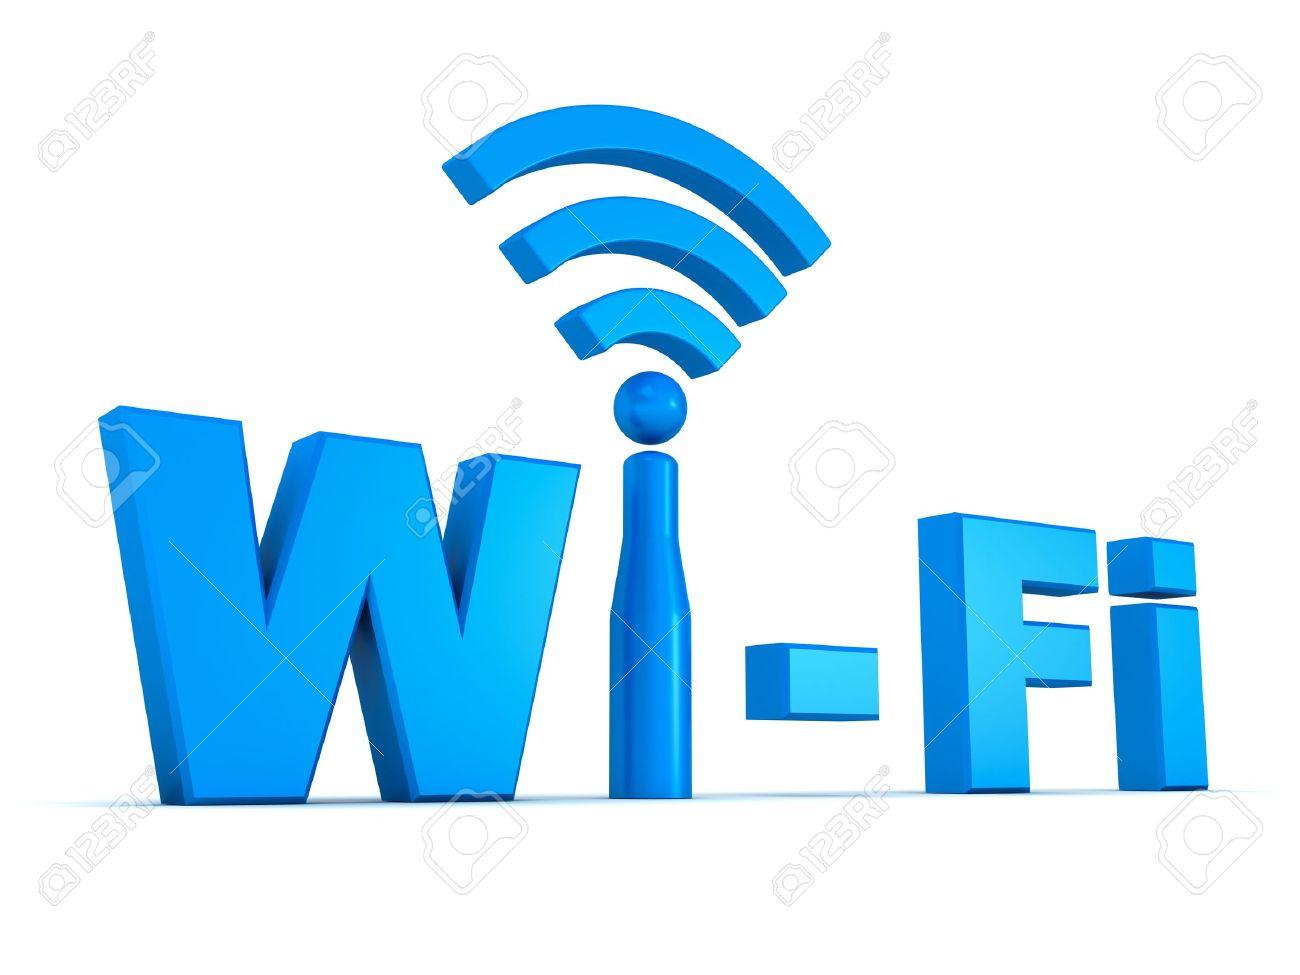 Wifi icon concept isolated on white background Stock Photo - 12432516